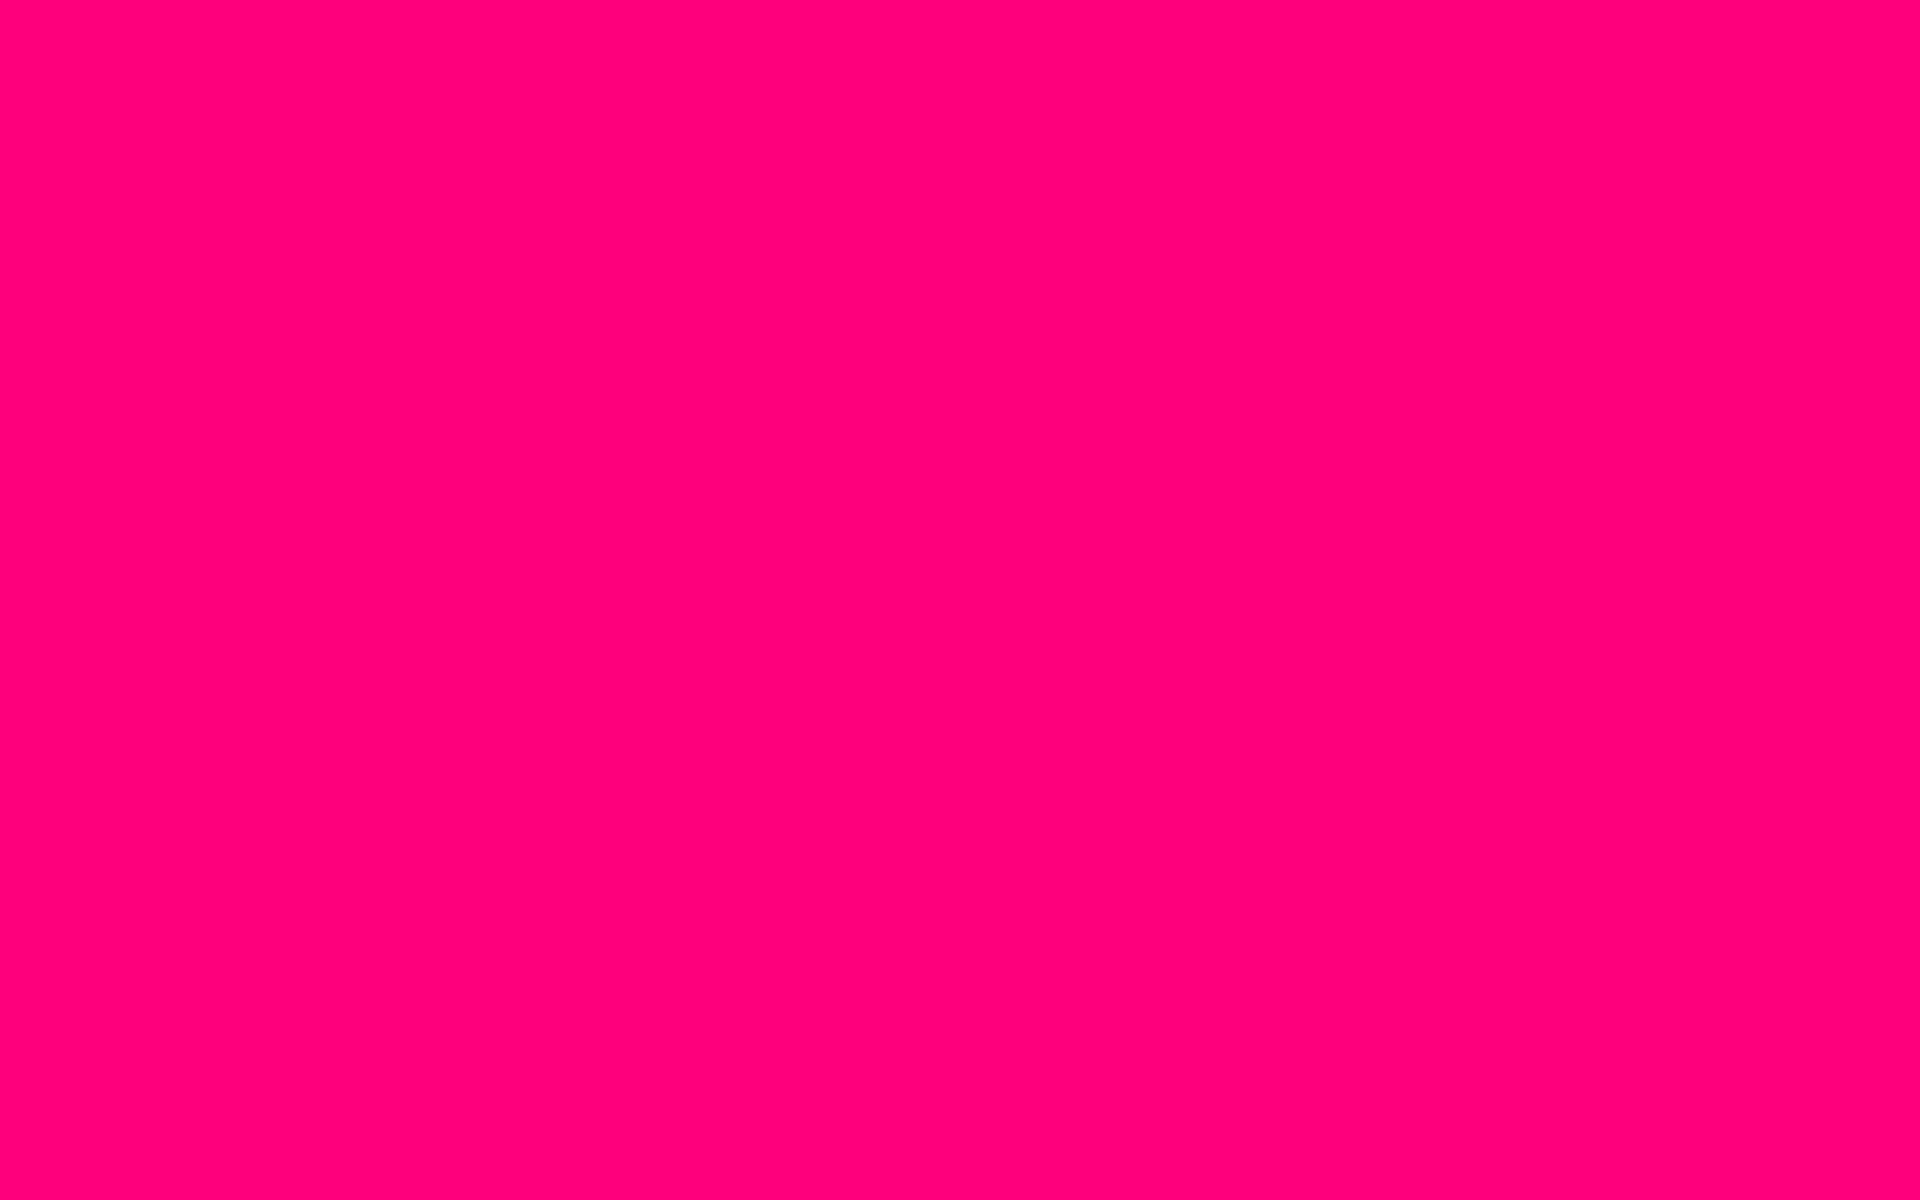 1920x1200 Rose Solid Color Background